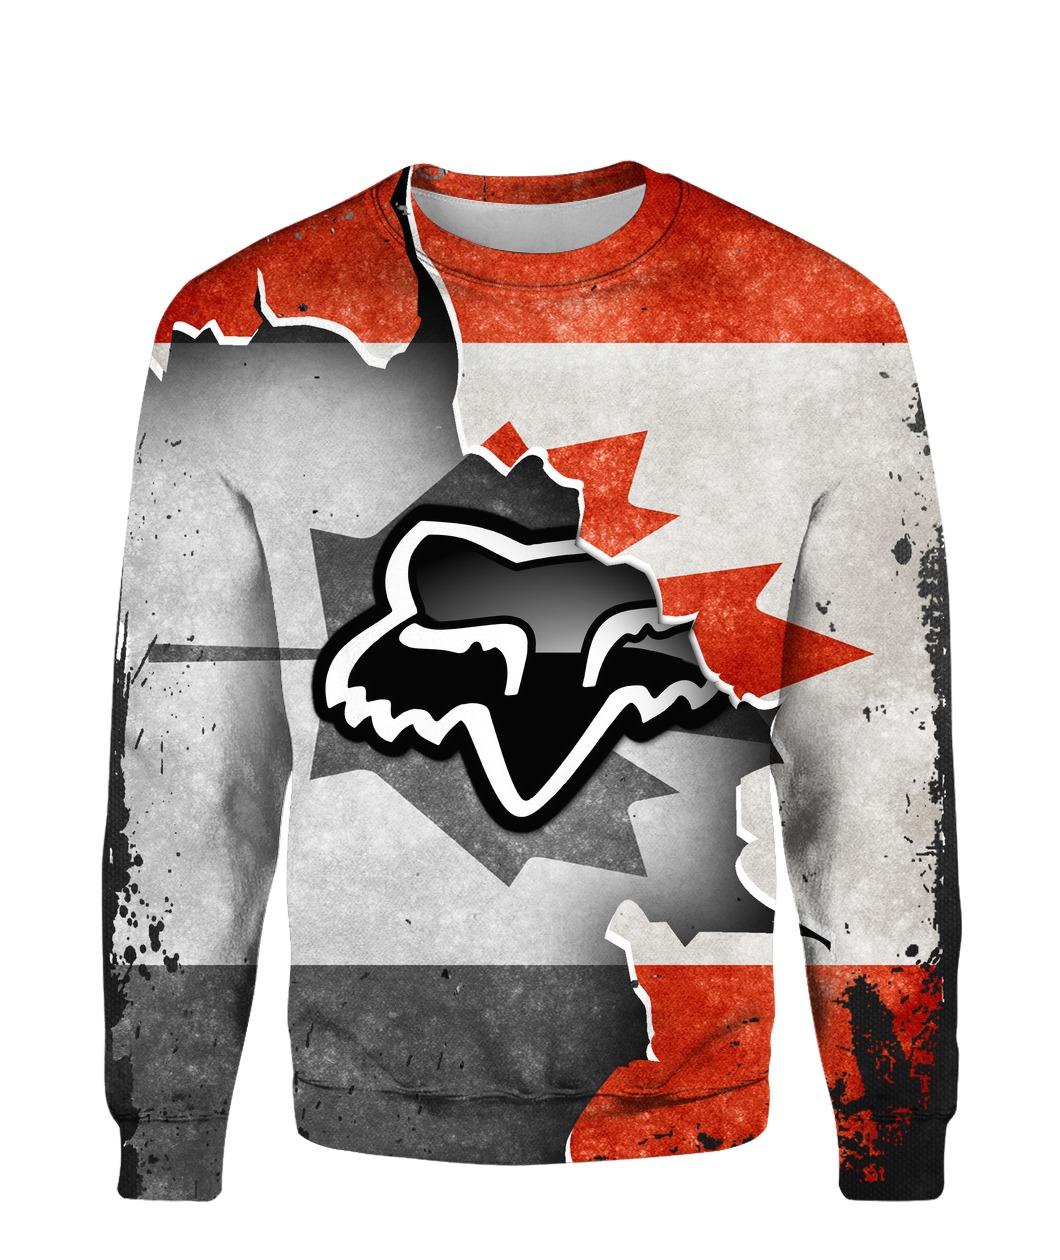 Fox racing in canada flag full printing sweatshirt